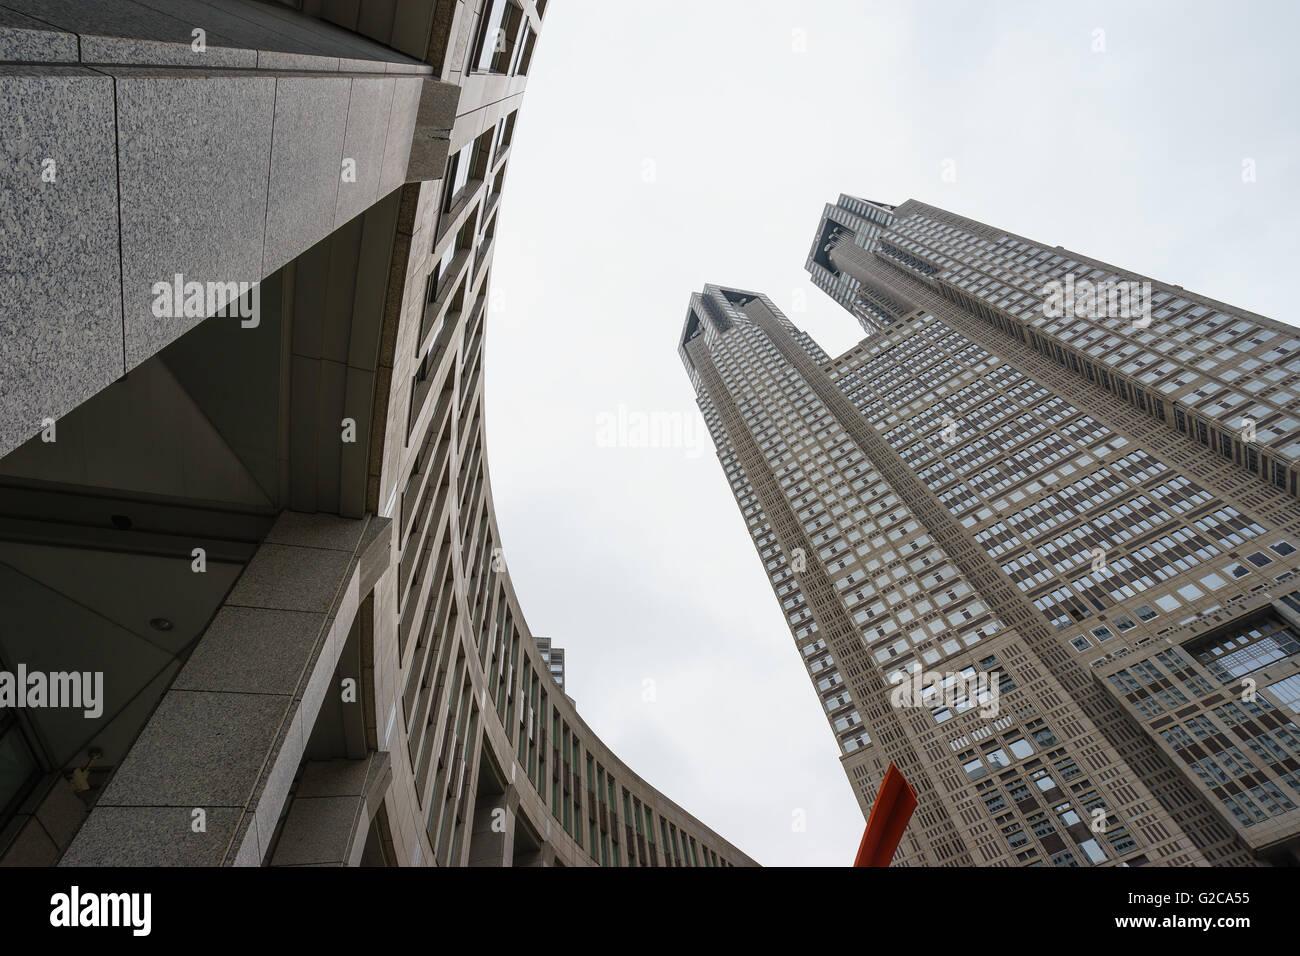 The Tokyo Metropolitan Government Building, Shinjuku, Tokyo, Japan. - Stock Image